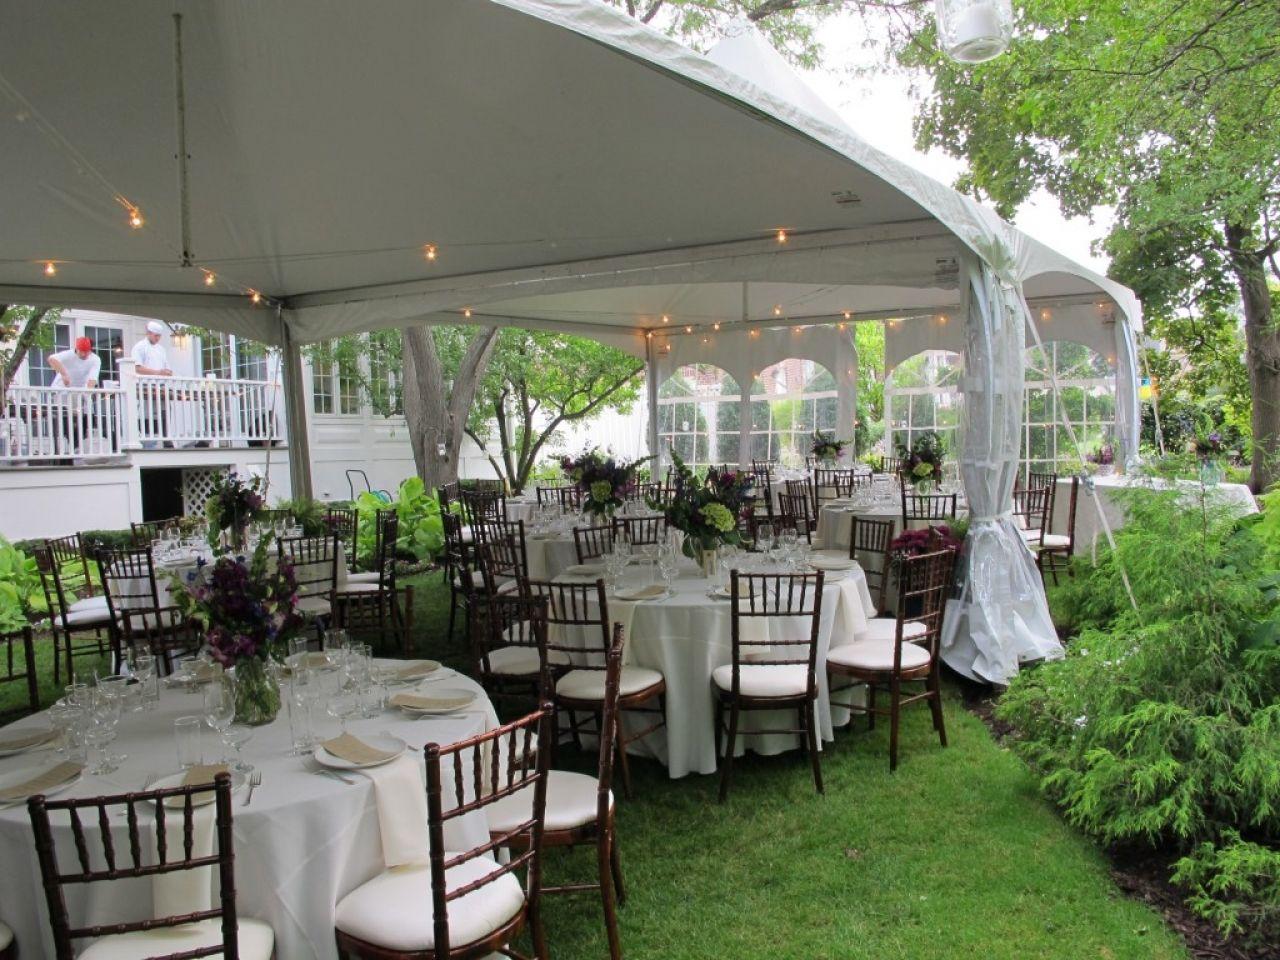 Tent For Backyard Wedding